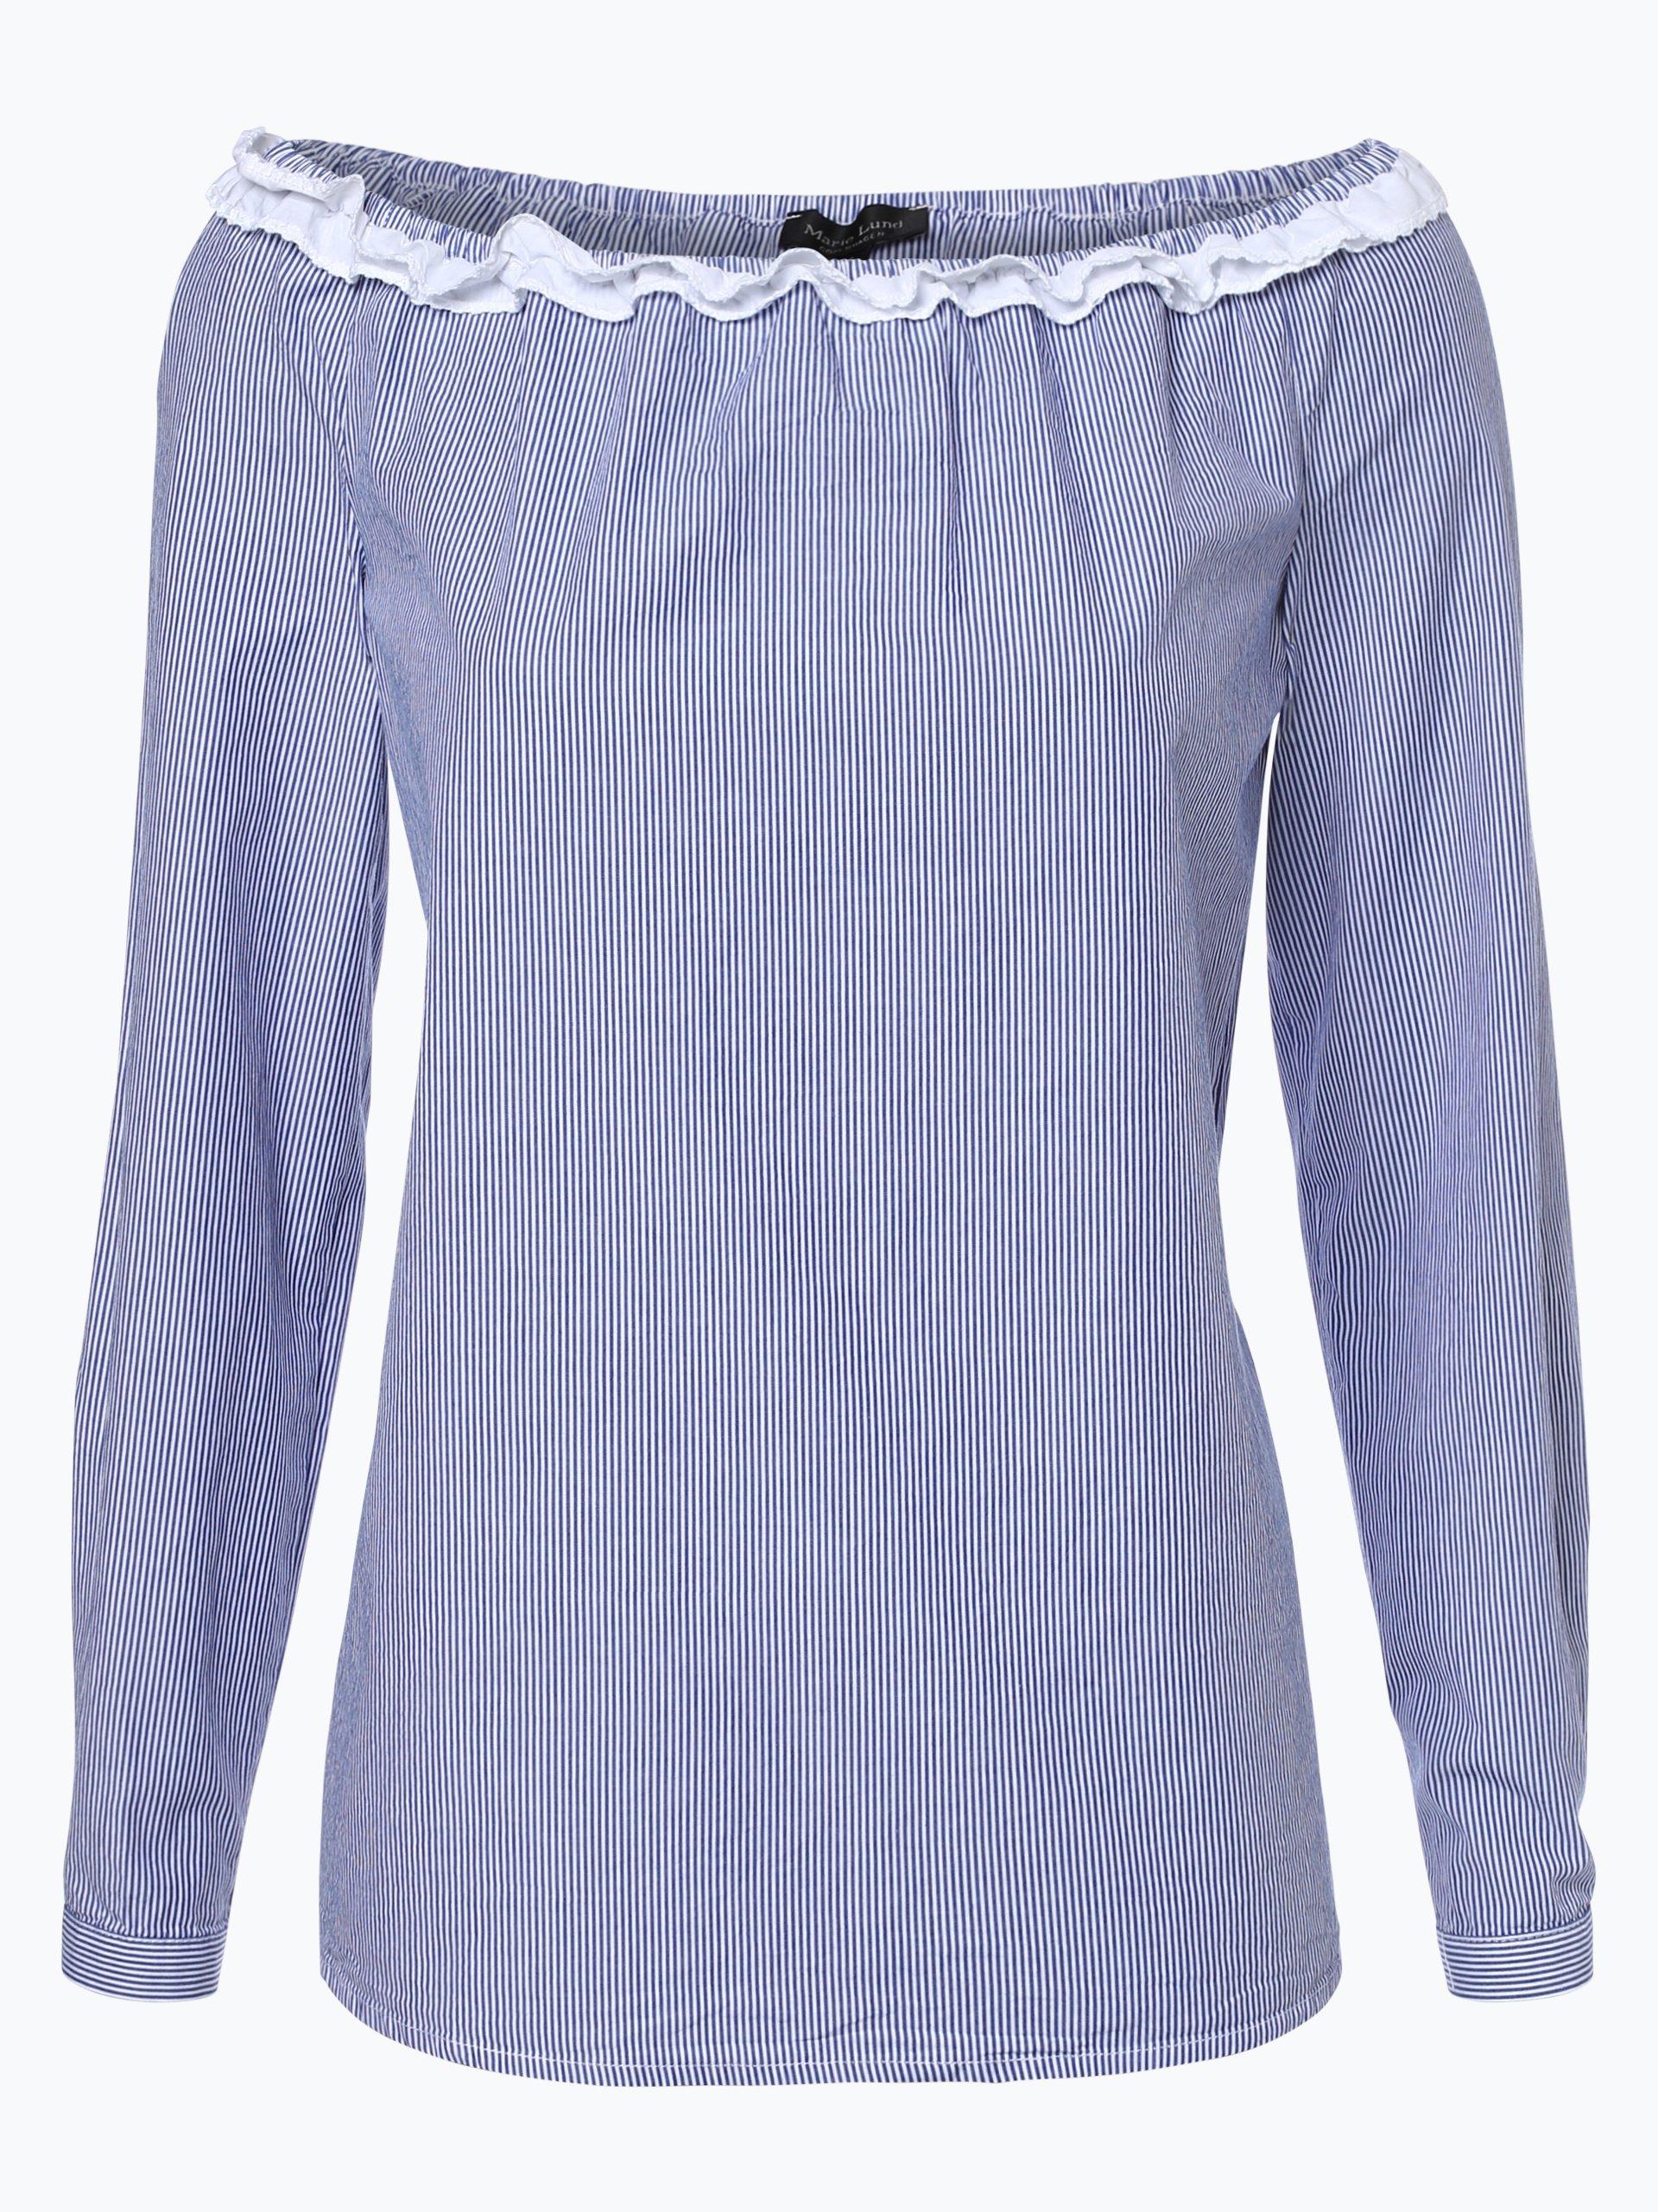 marie lund damen bluse blau gemustert online kaufen vangraaf com. Black Bedroom Furniture Sets. Home Design Ideas